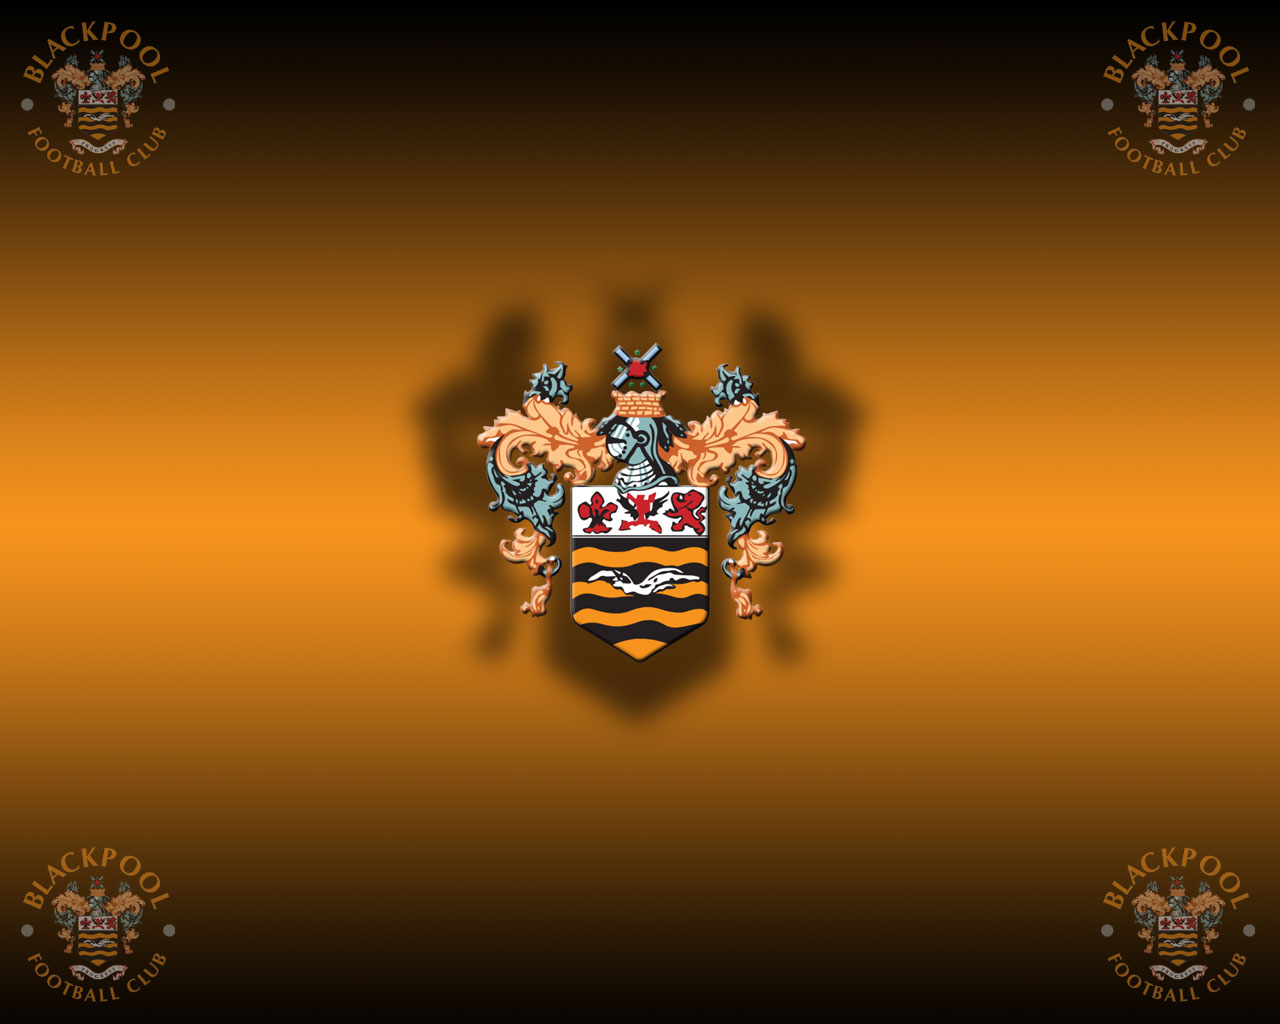 Blackpool Football Wallpaper